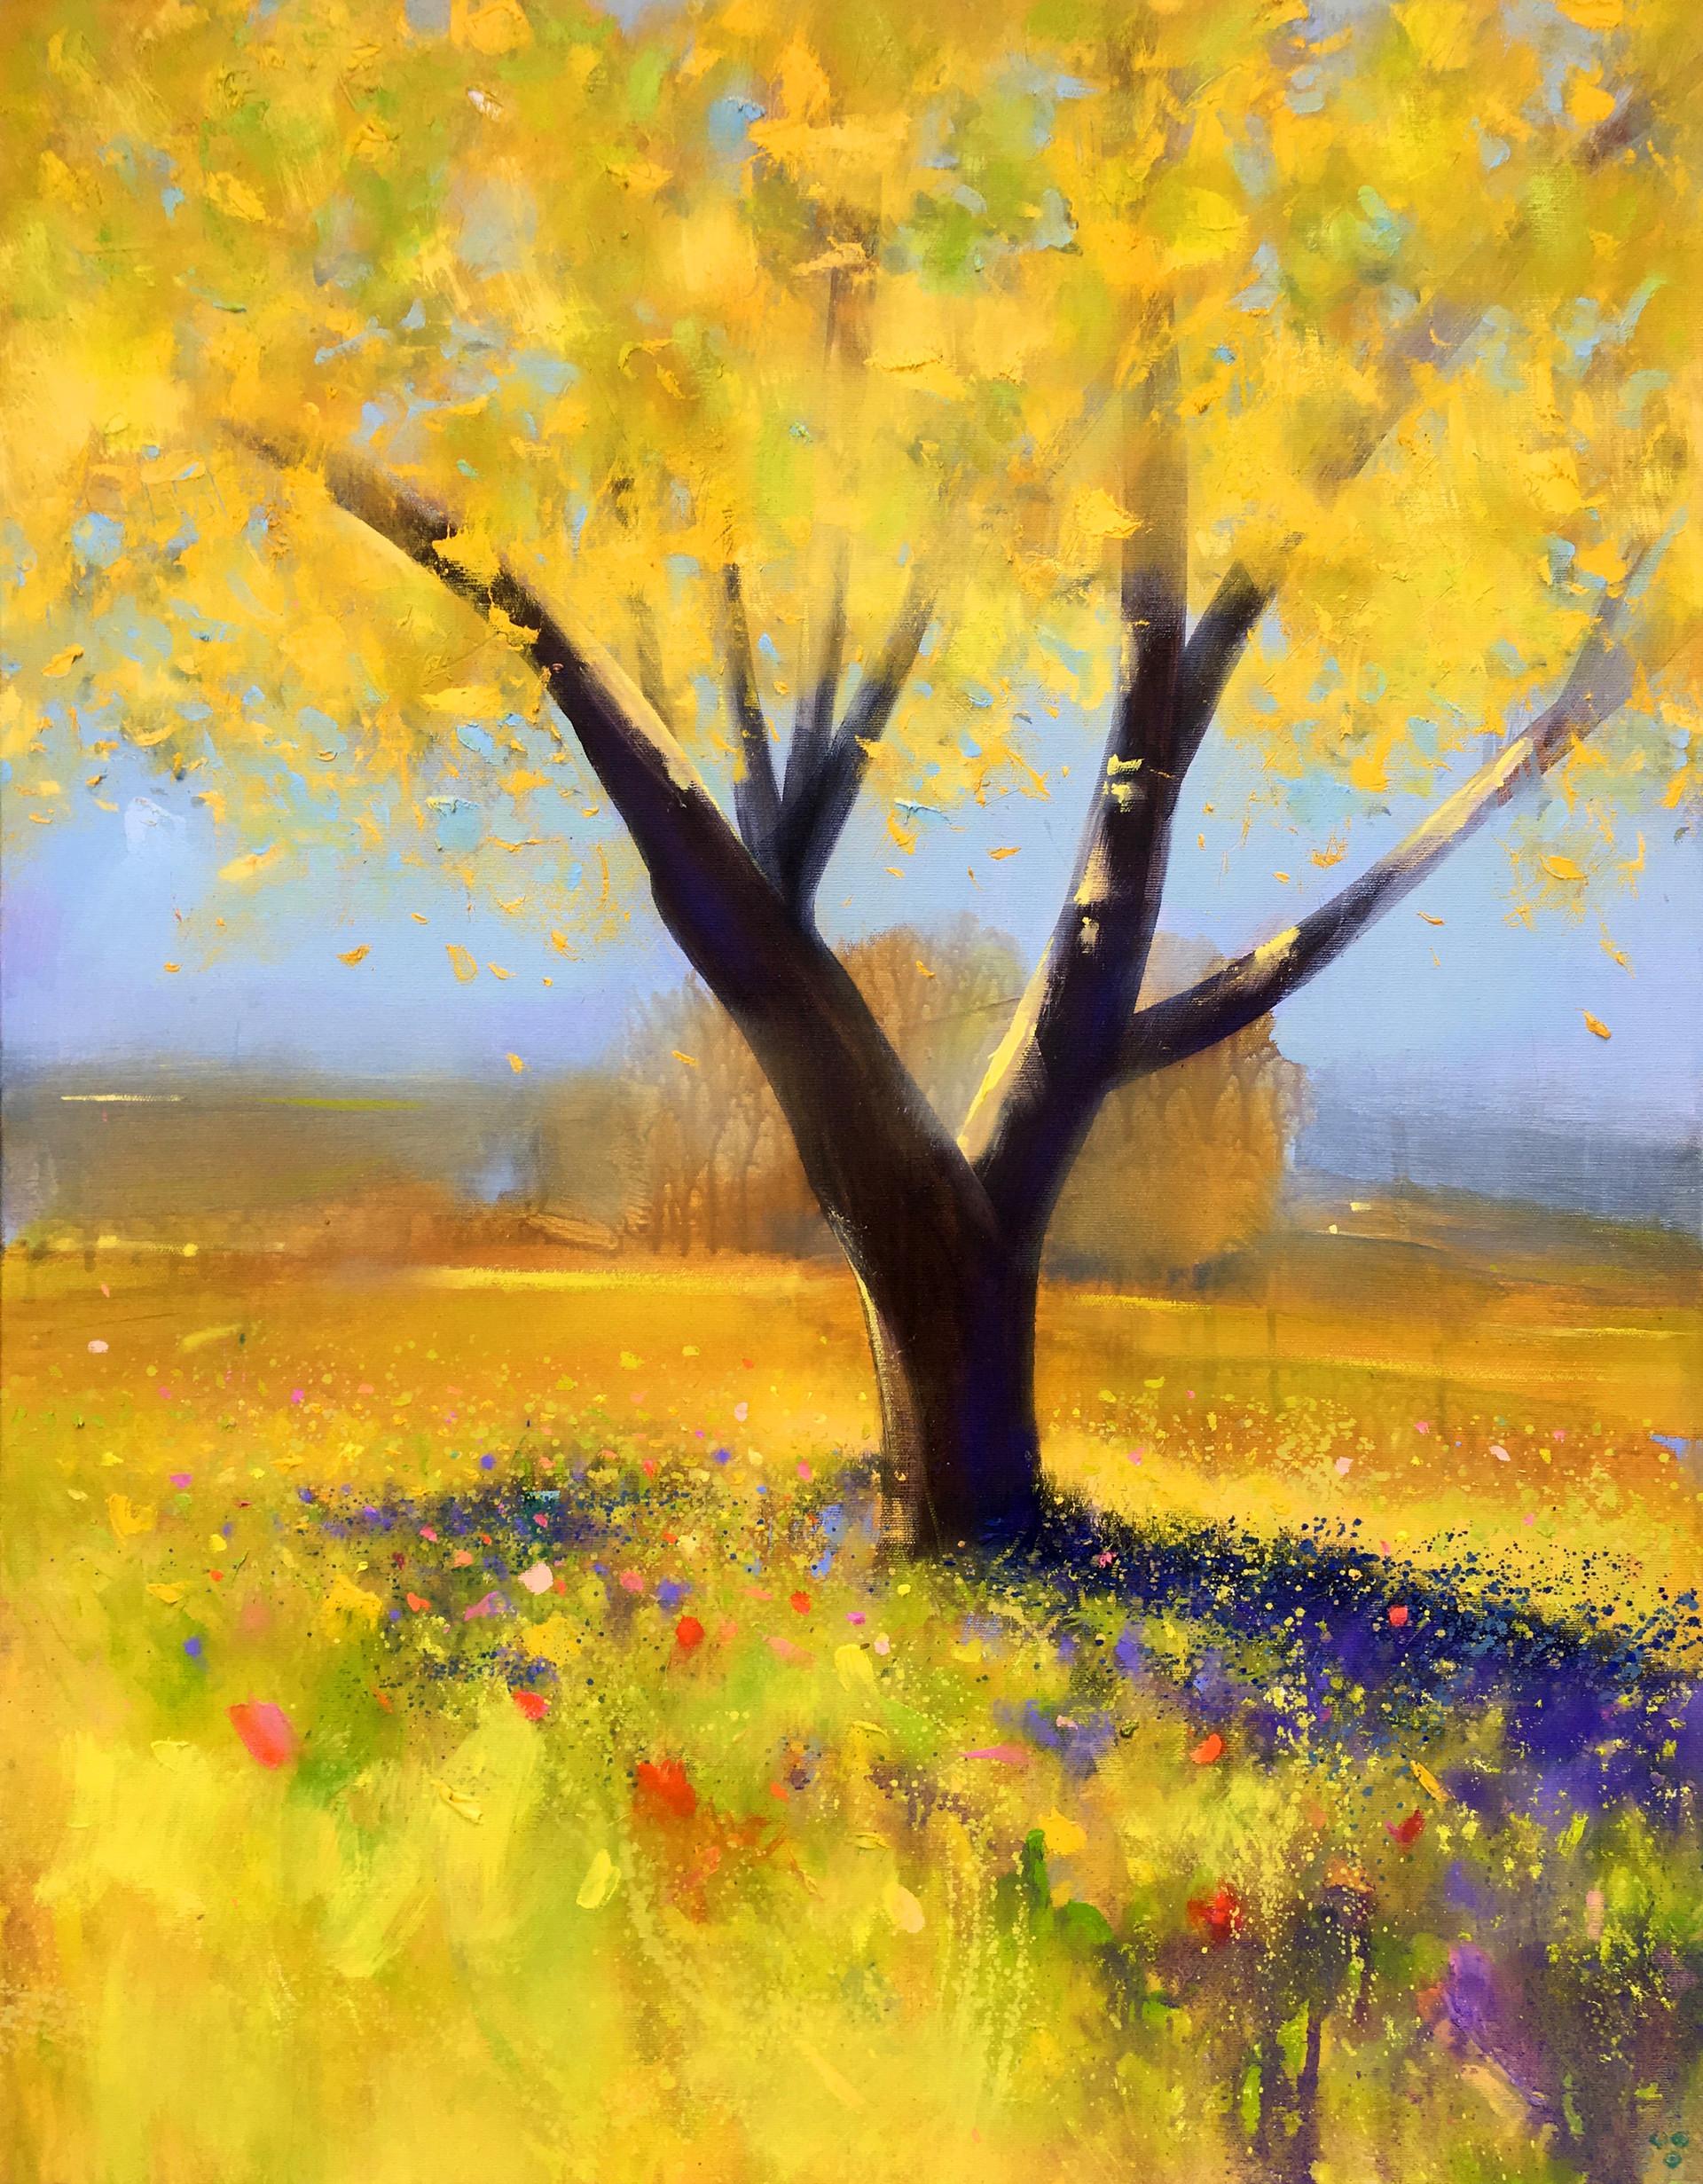 Golden Light on Tree